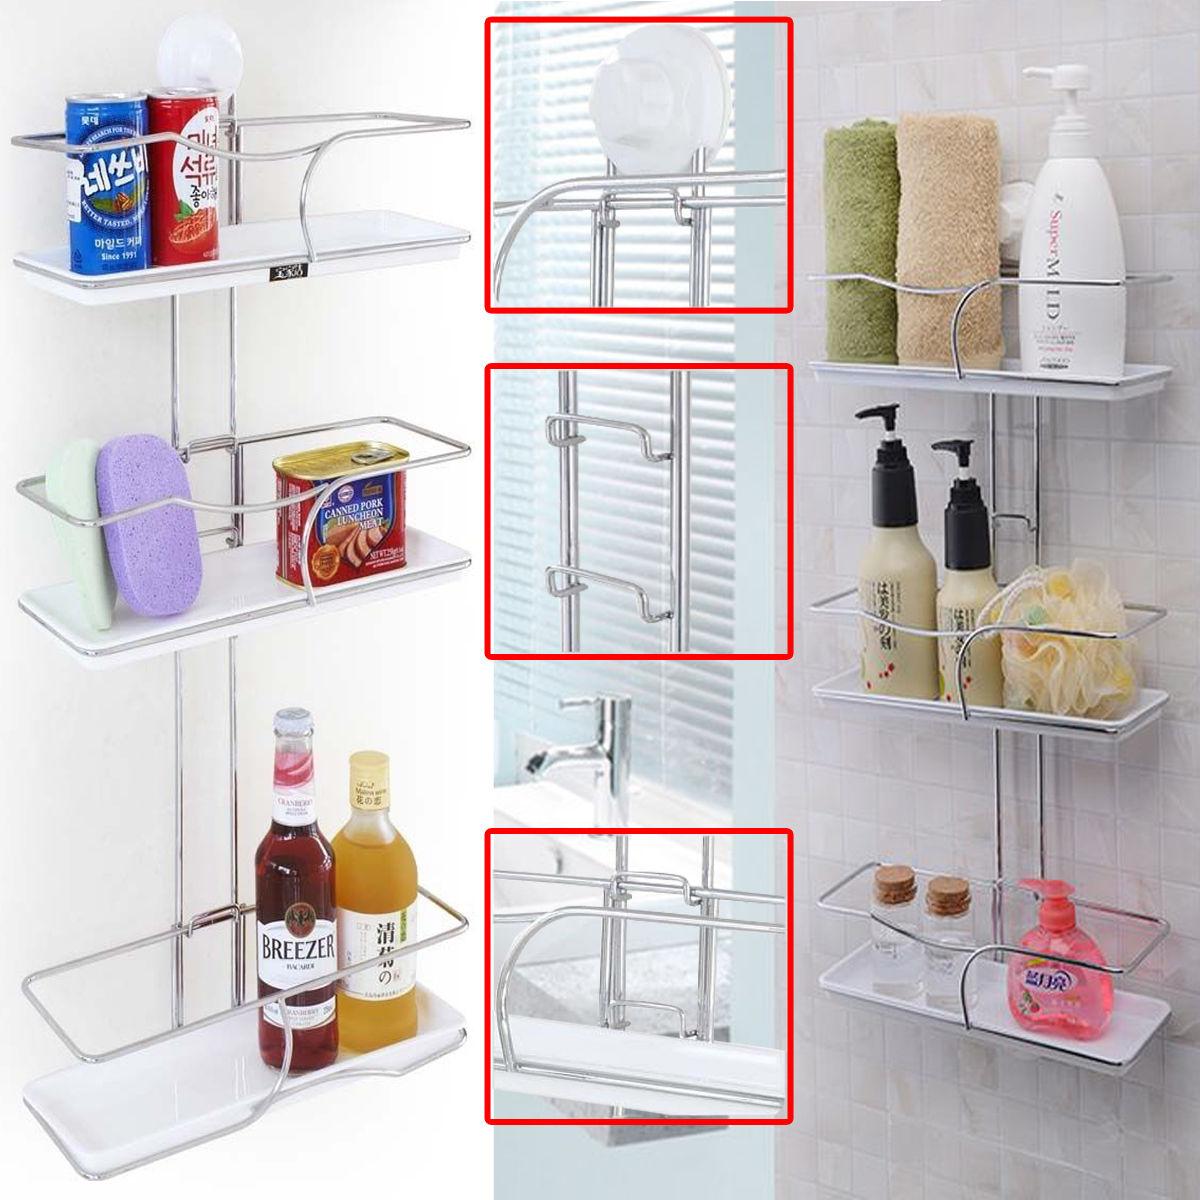 Details About 3 Tier Adjustable Bathroom Kitchen Storage Rack Caddy Organiser Shelf Telescopic with regard to dimensions 1200 X 1200